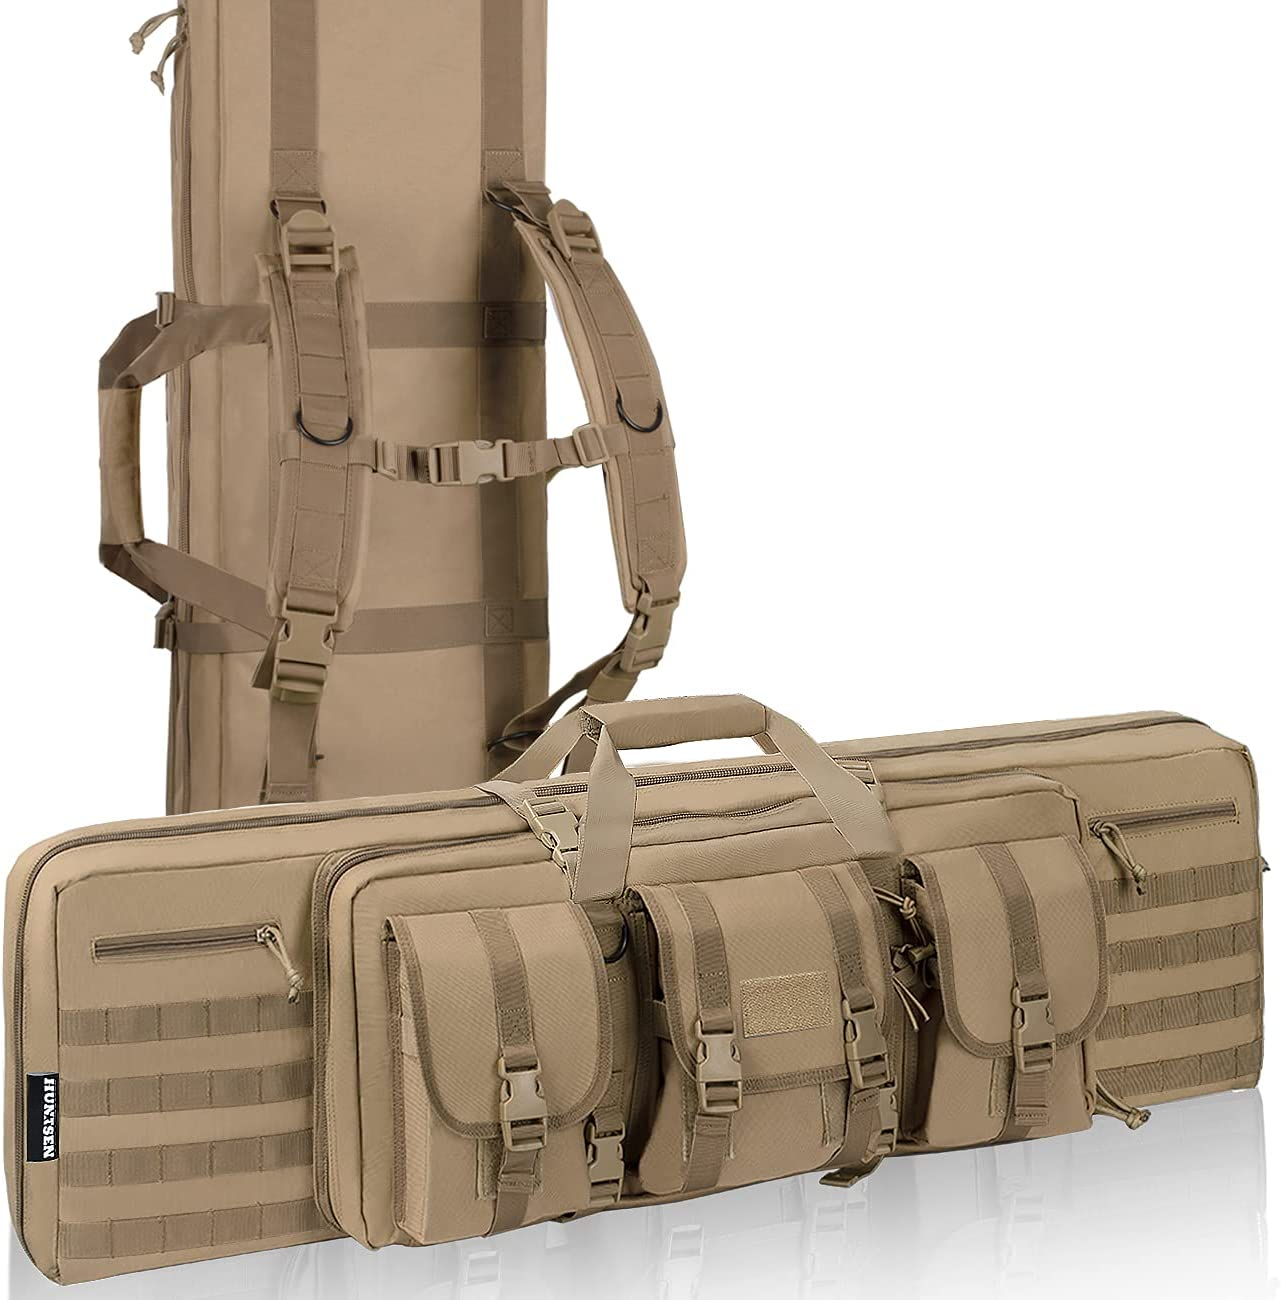 HUNTSEN Rifle Bag Portland Mall Soft Double Gun for Handguns Case Fort Worth Mall Rifles and C